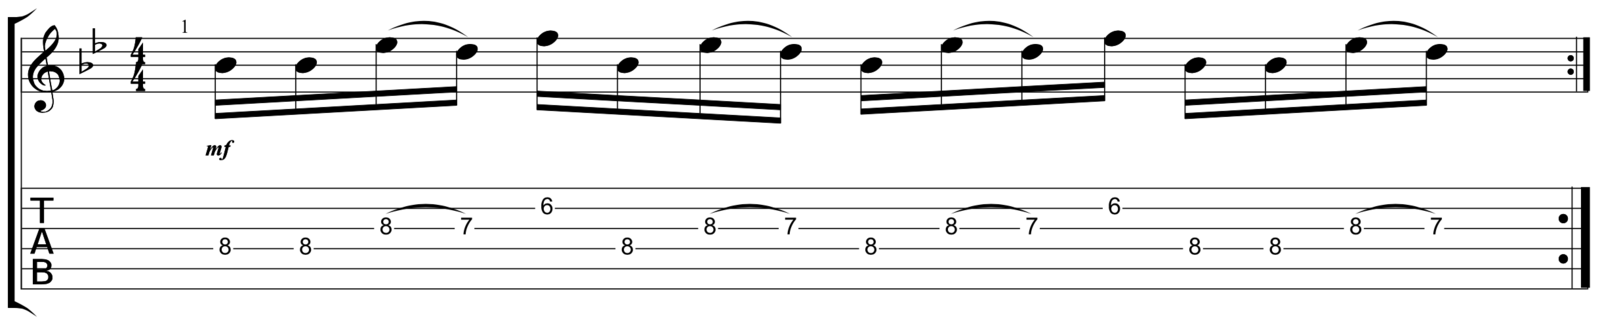 Lead Verse 2 Riff